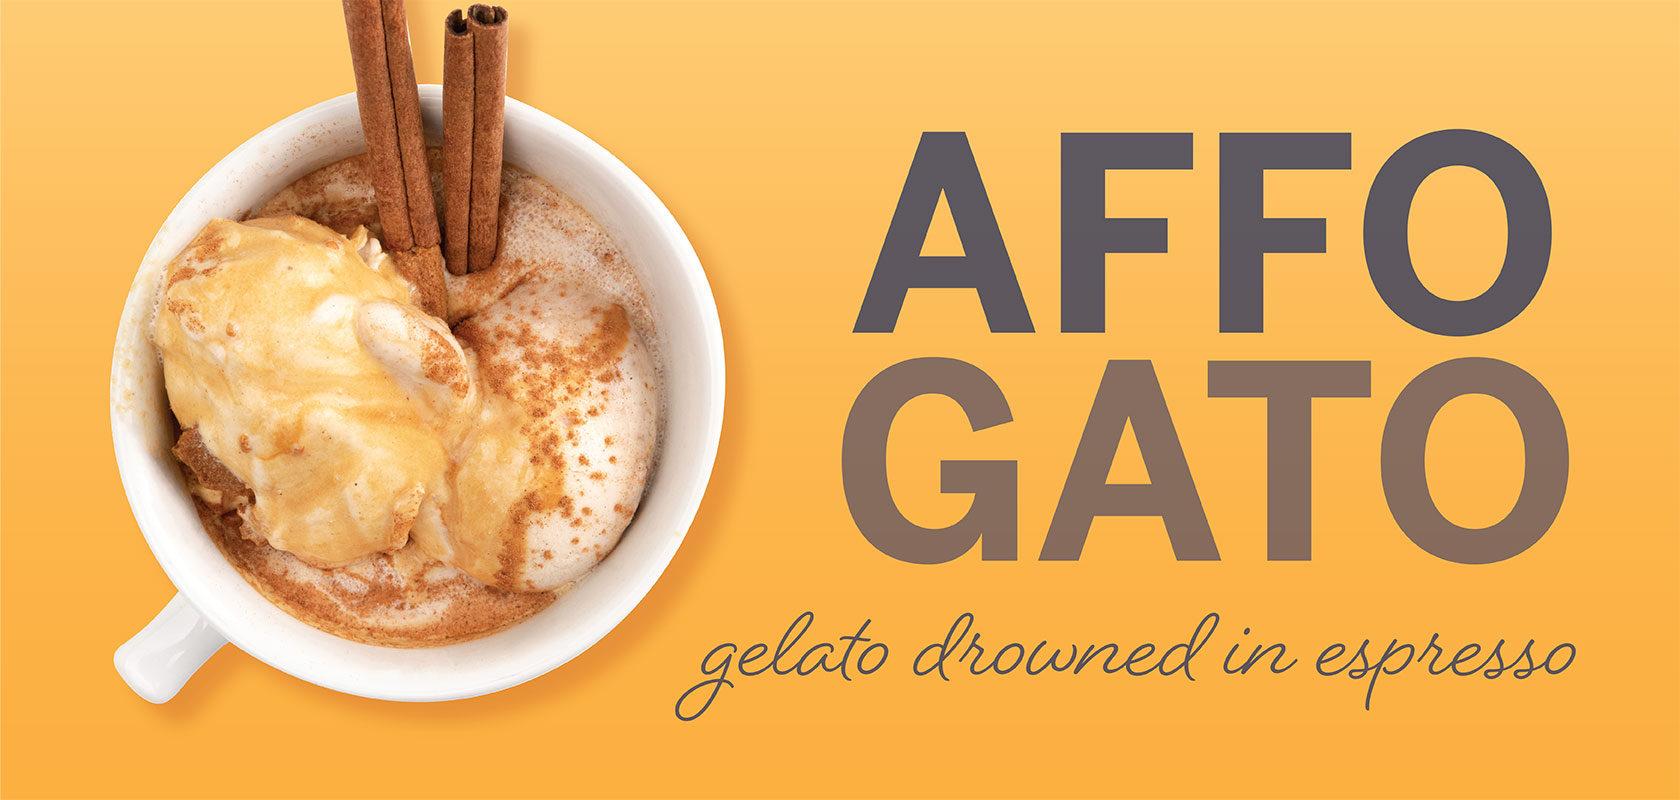 AFFO GATO - Gelao Drowned in Espress